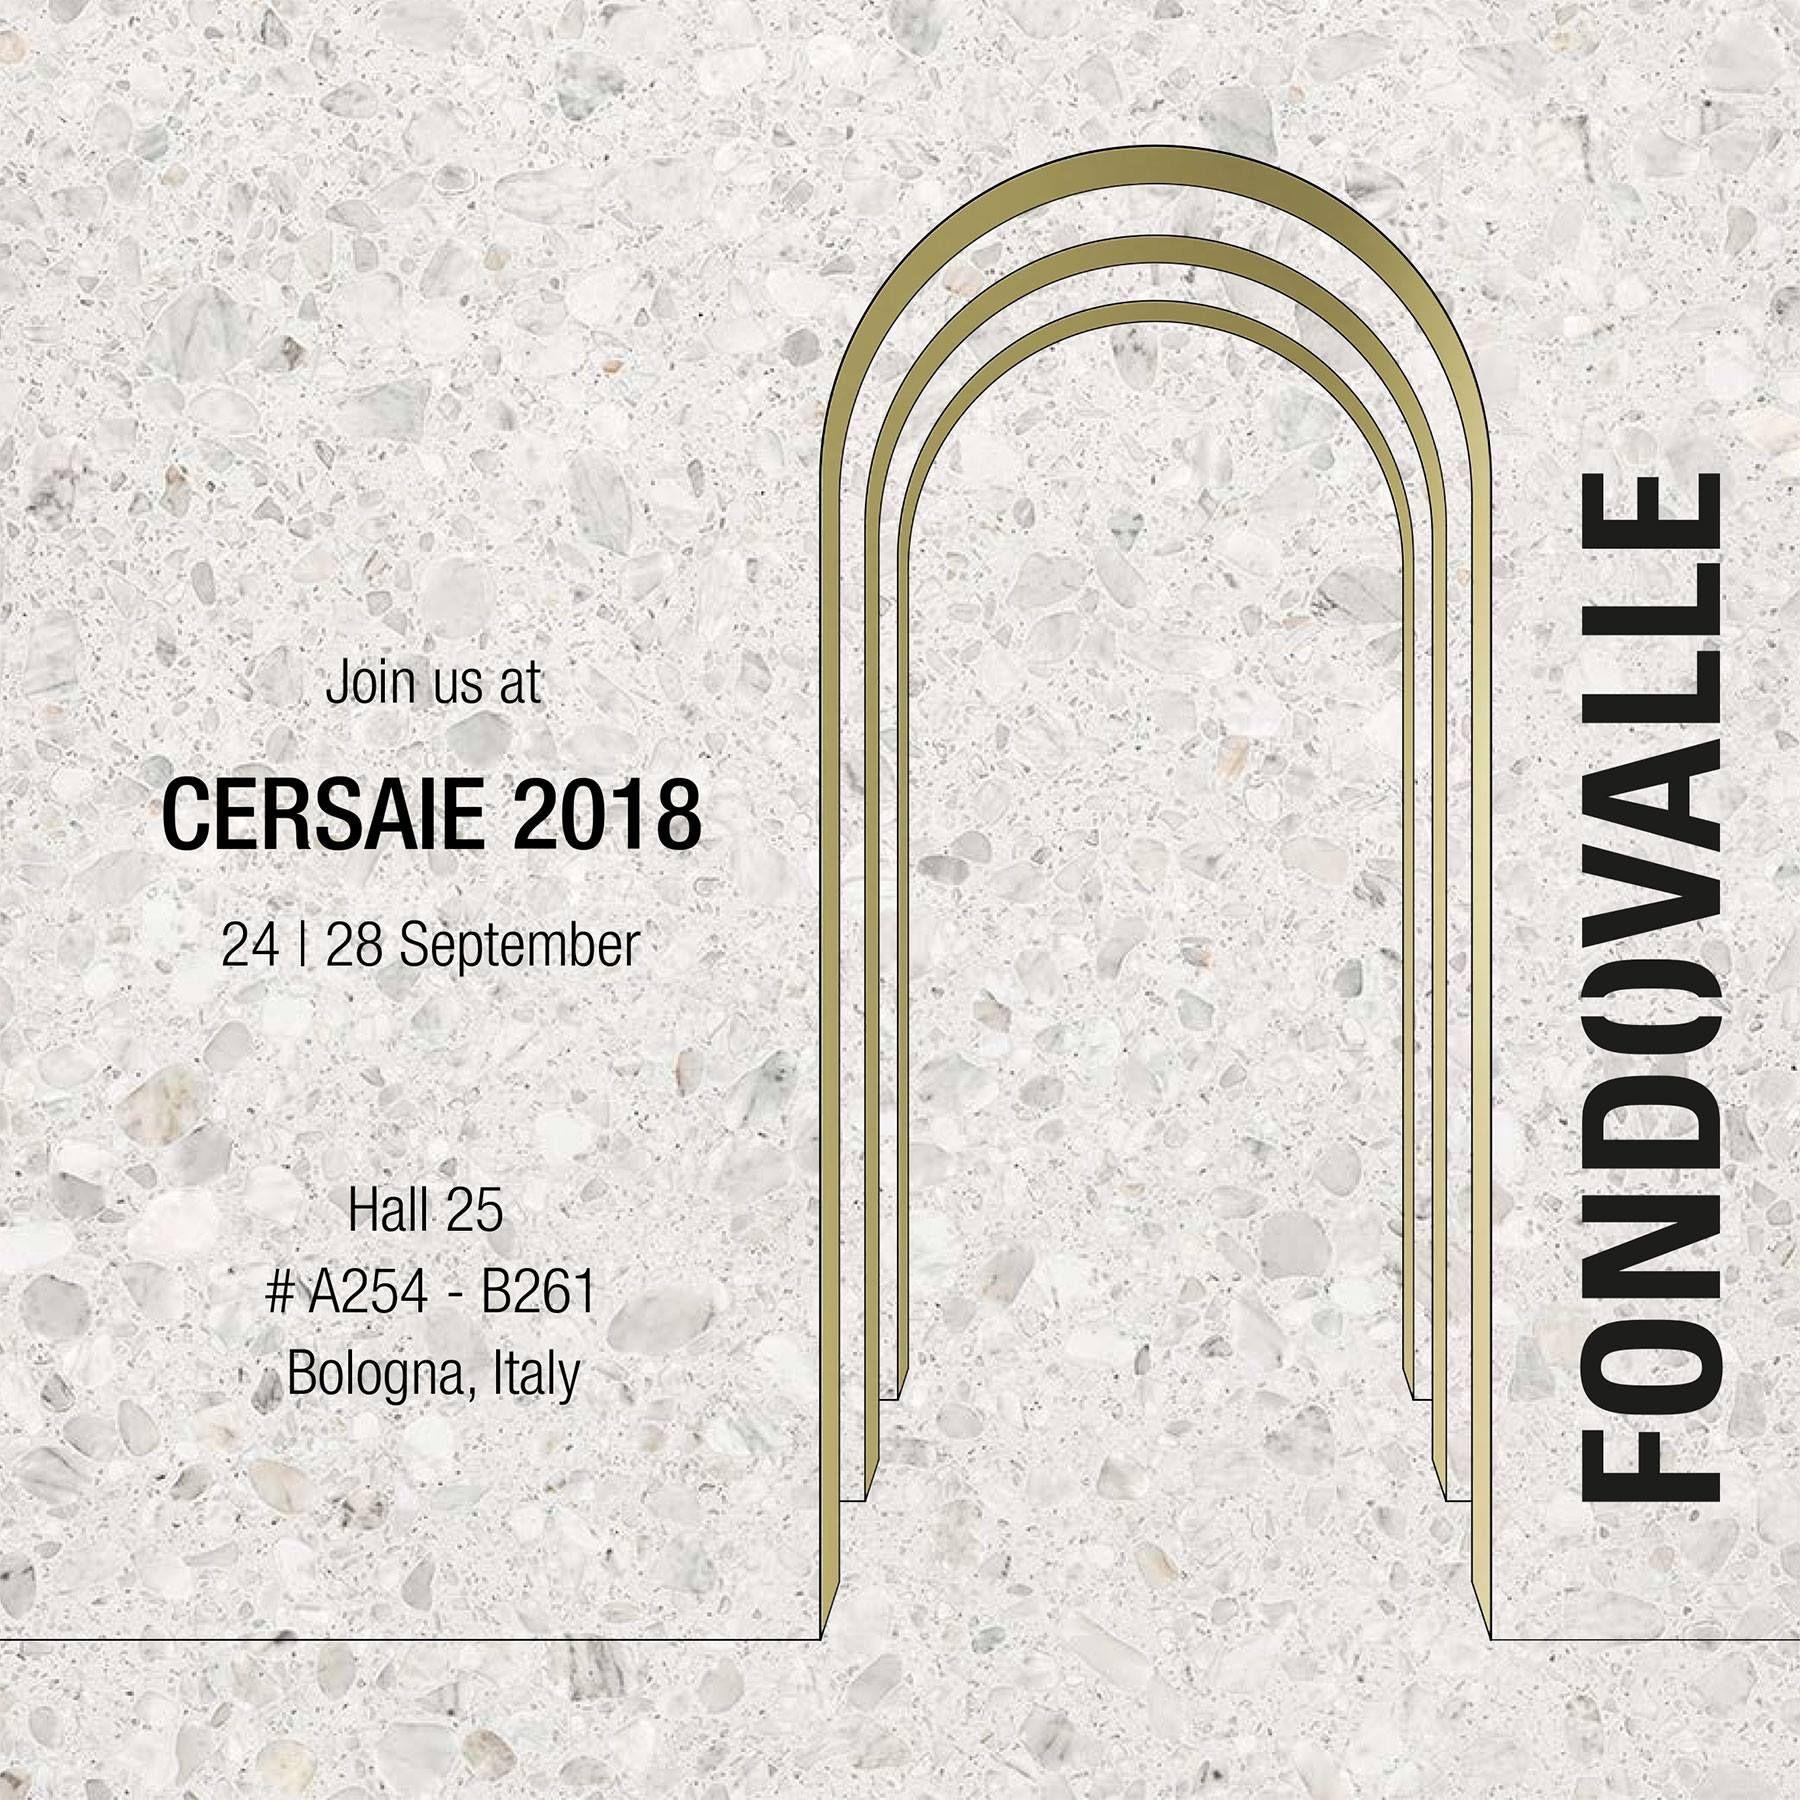 Fondovalle Ceramica Cersaie 2018 Silvestri Pavimenti Locandina 3 0